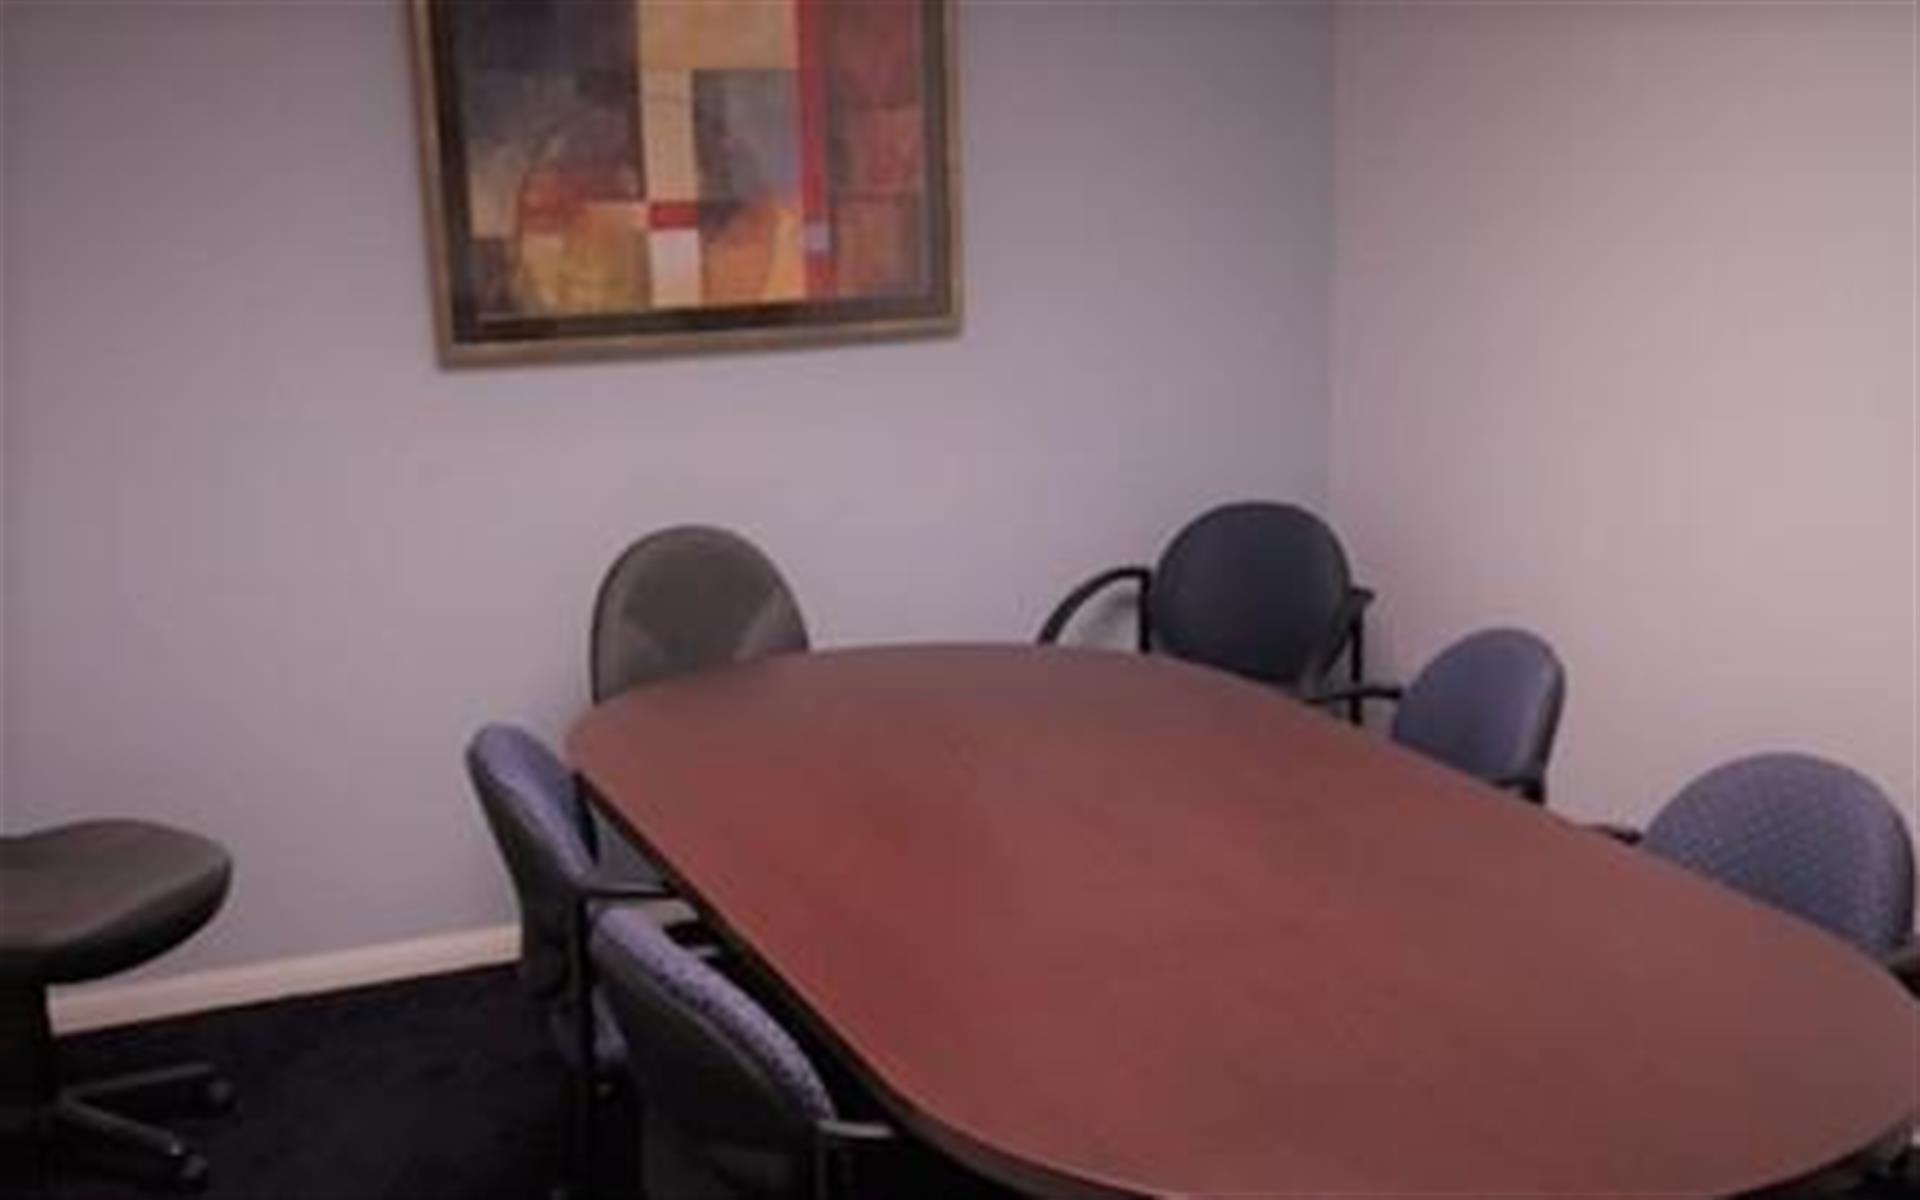 Huseby Mission Viejo - Meeting Room 2